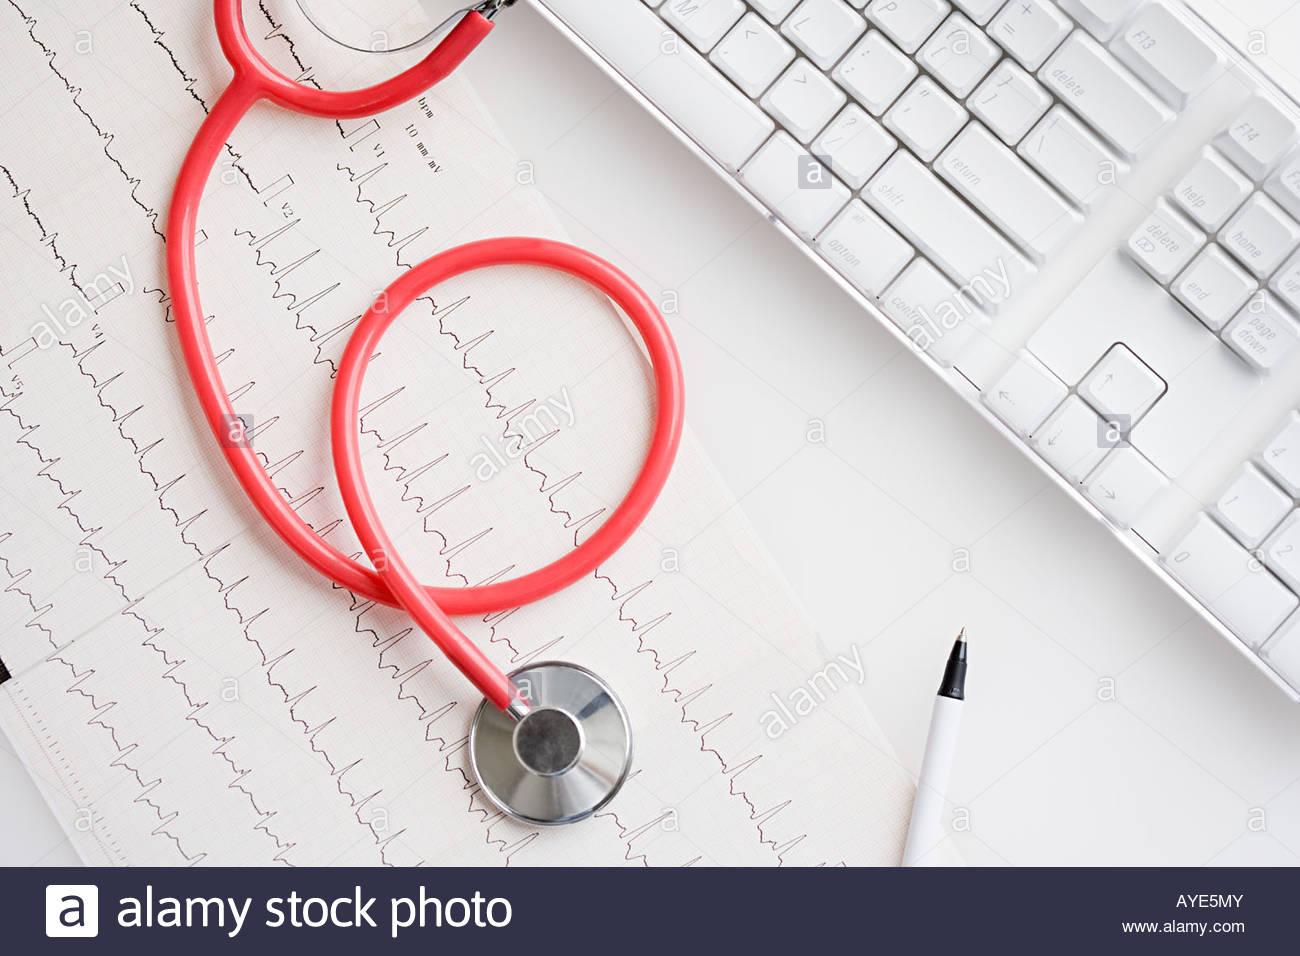 Medical equipment - Stock Image